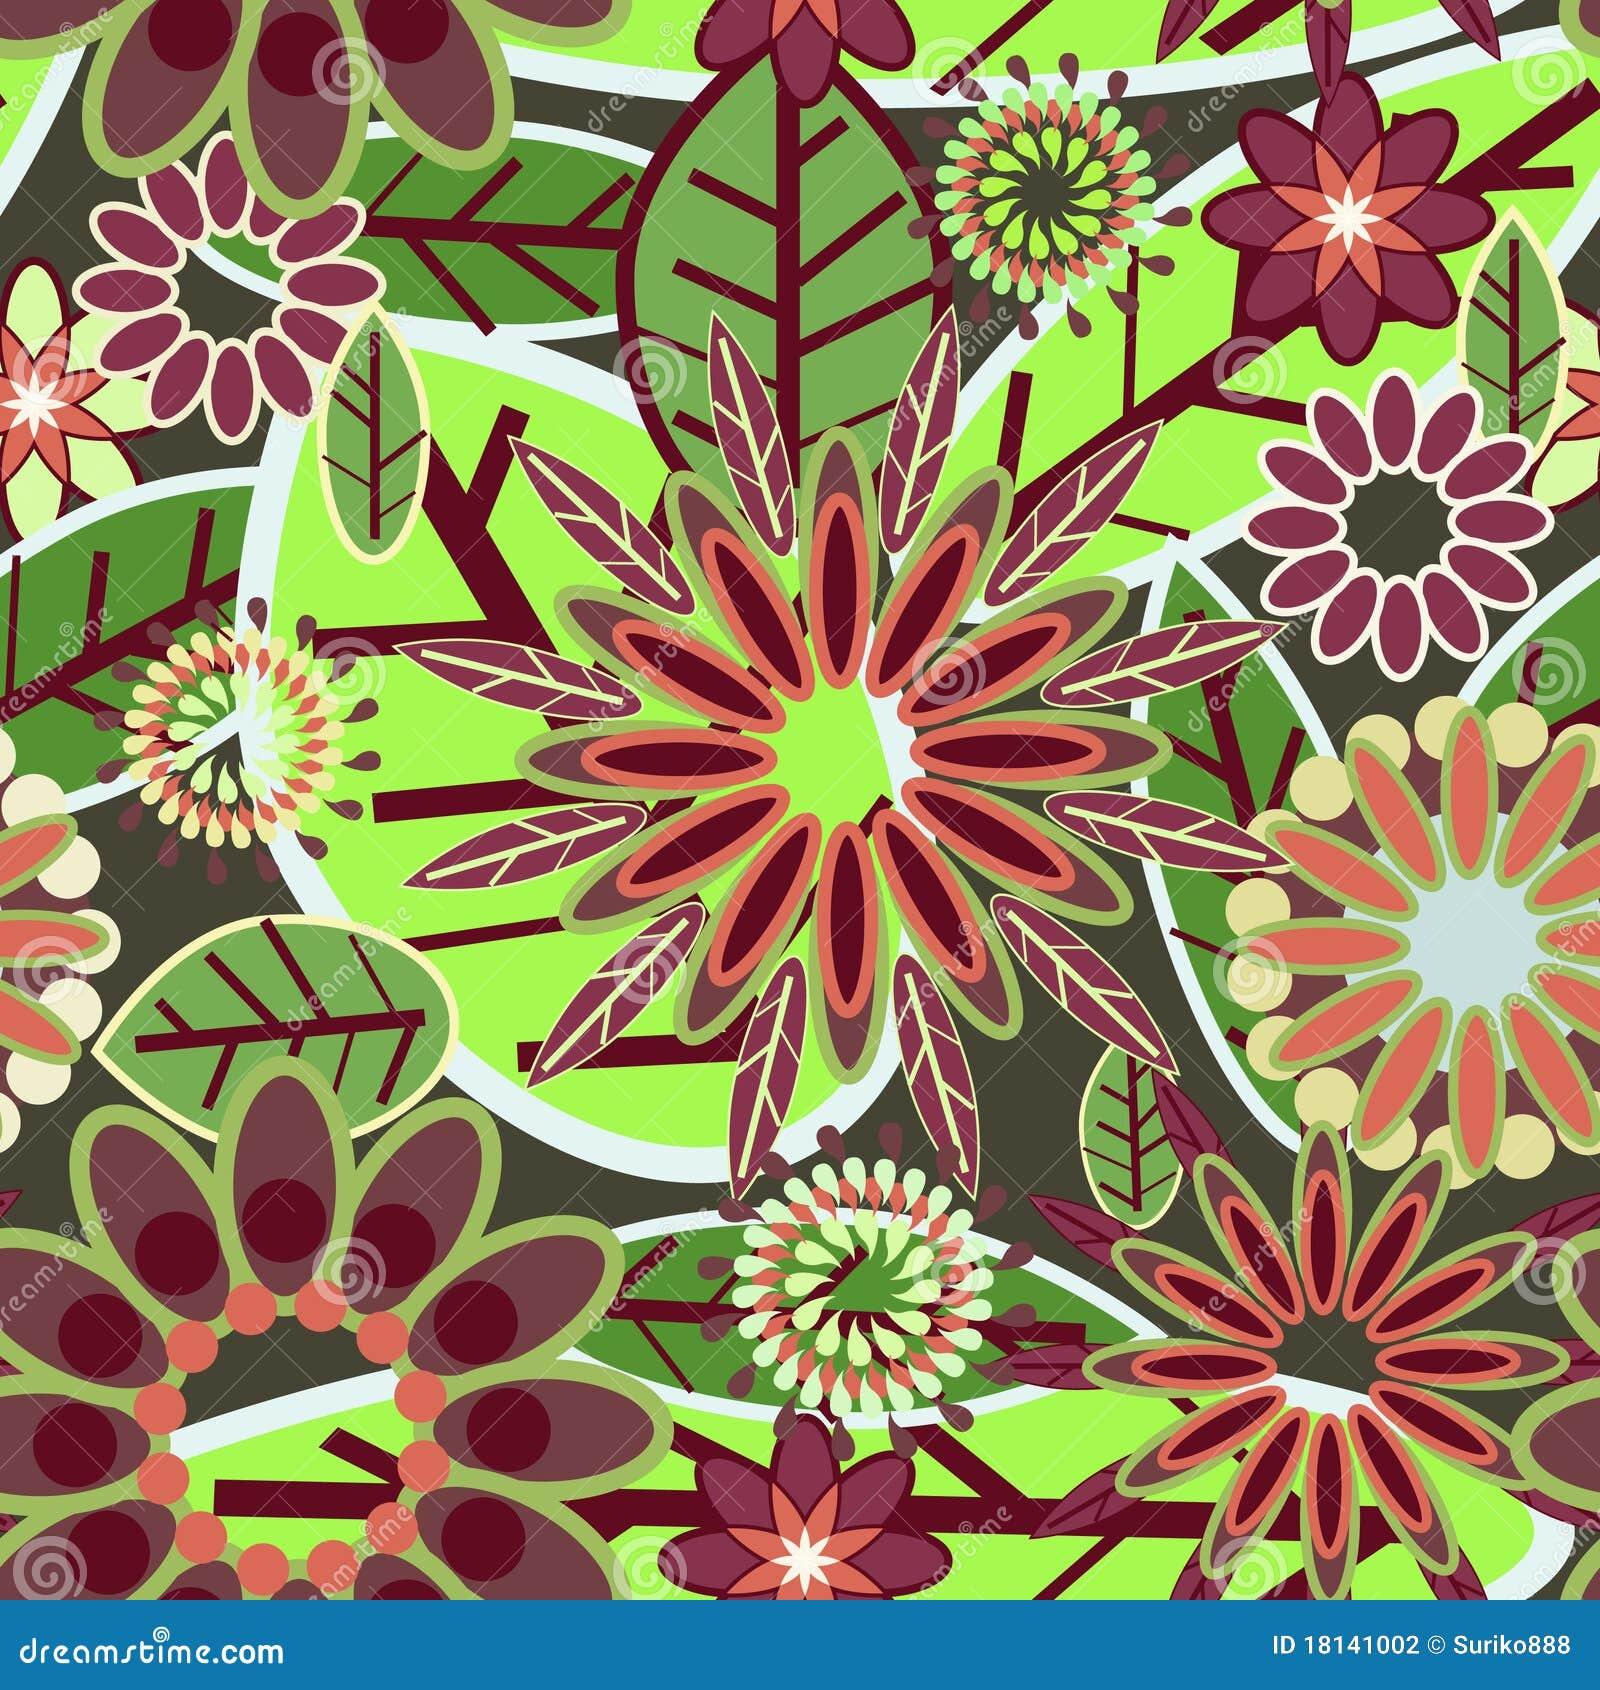 40 beautiful floral textures - photo #36